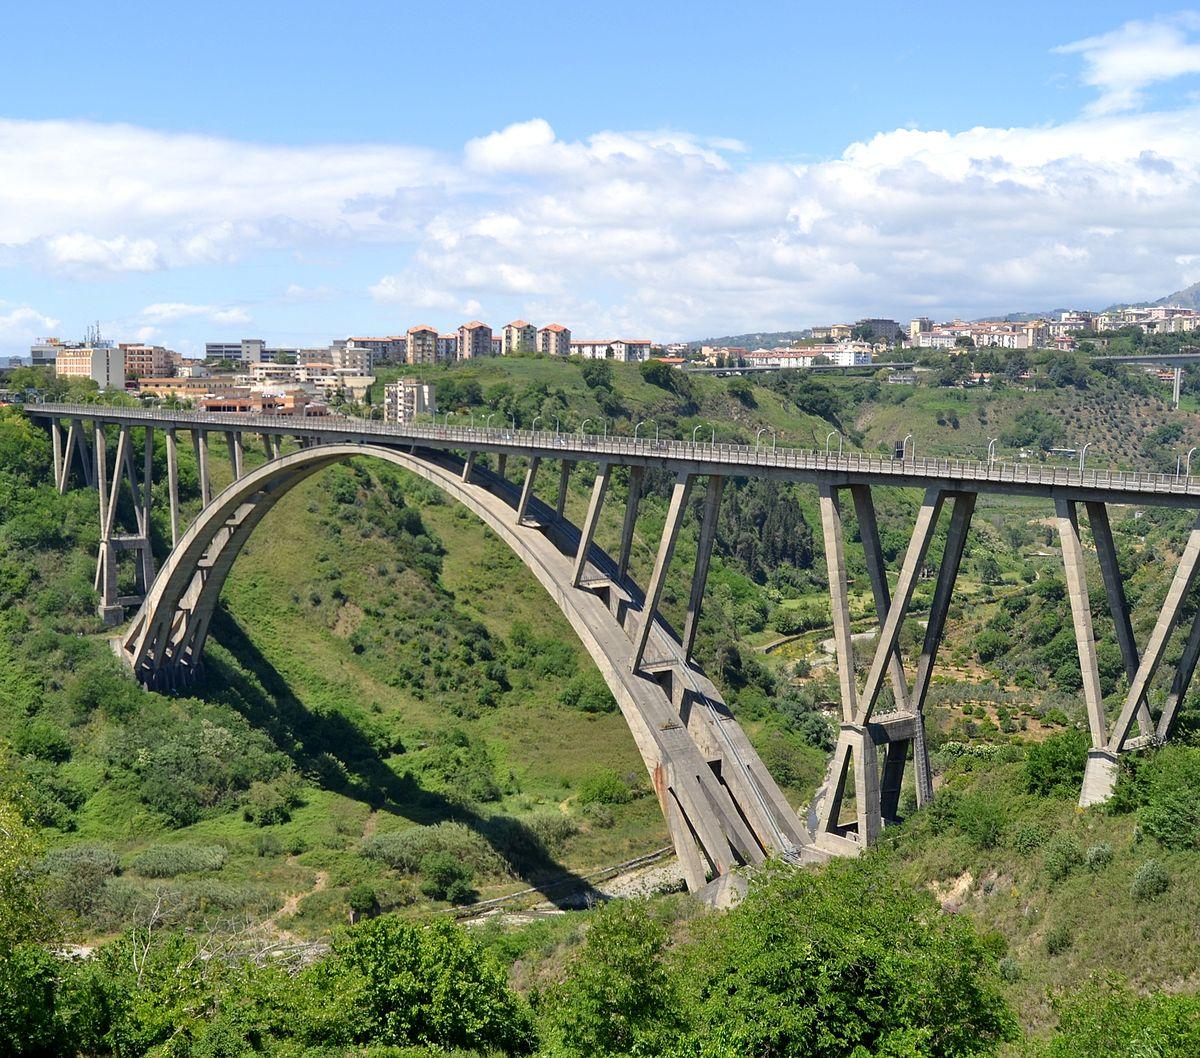 Ponte bisantis wikipedia for Foto di ponti coperti